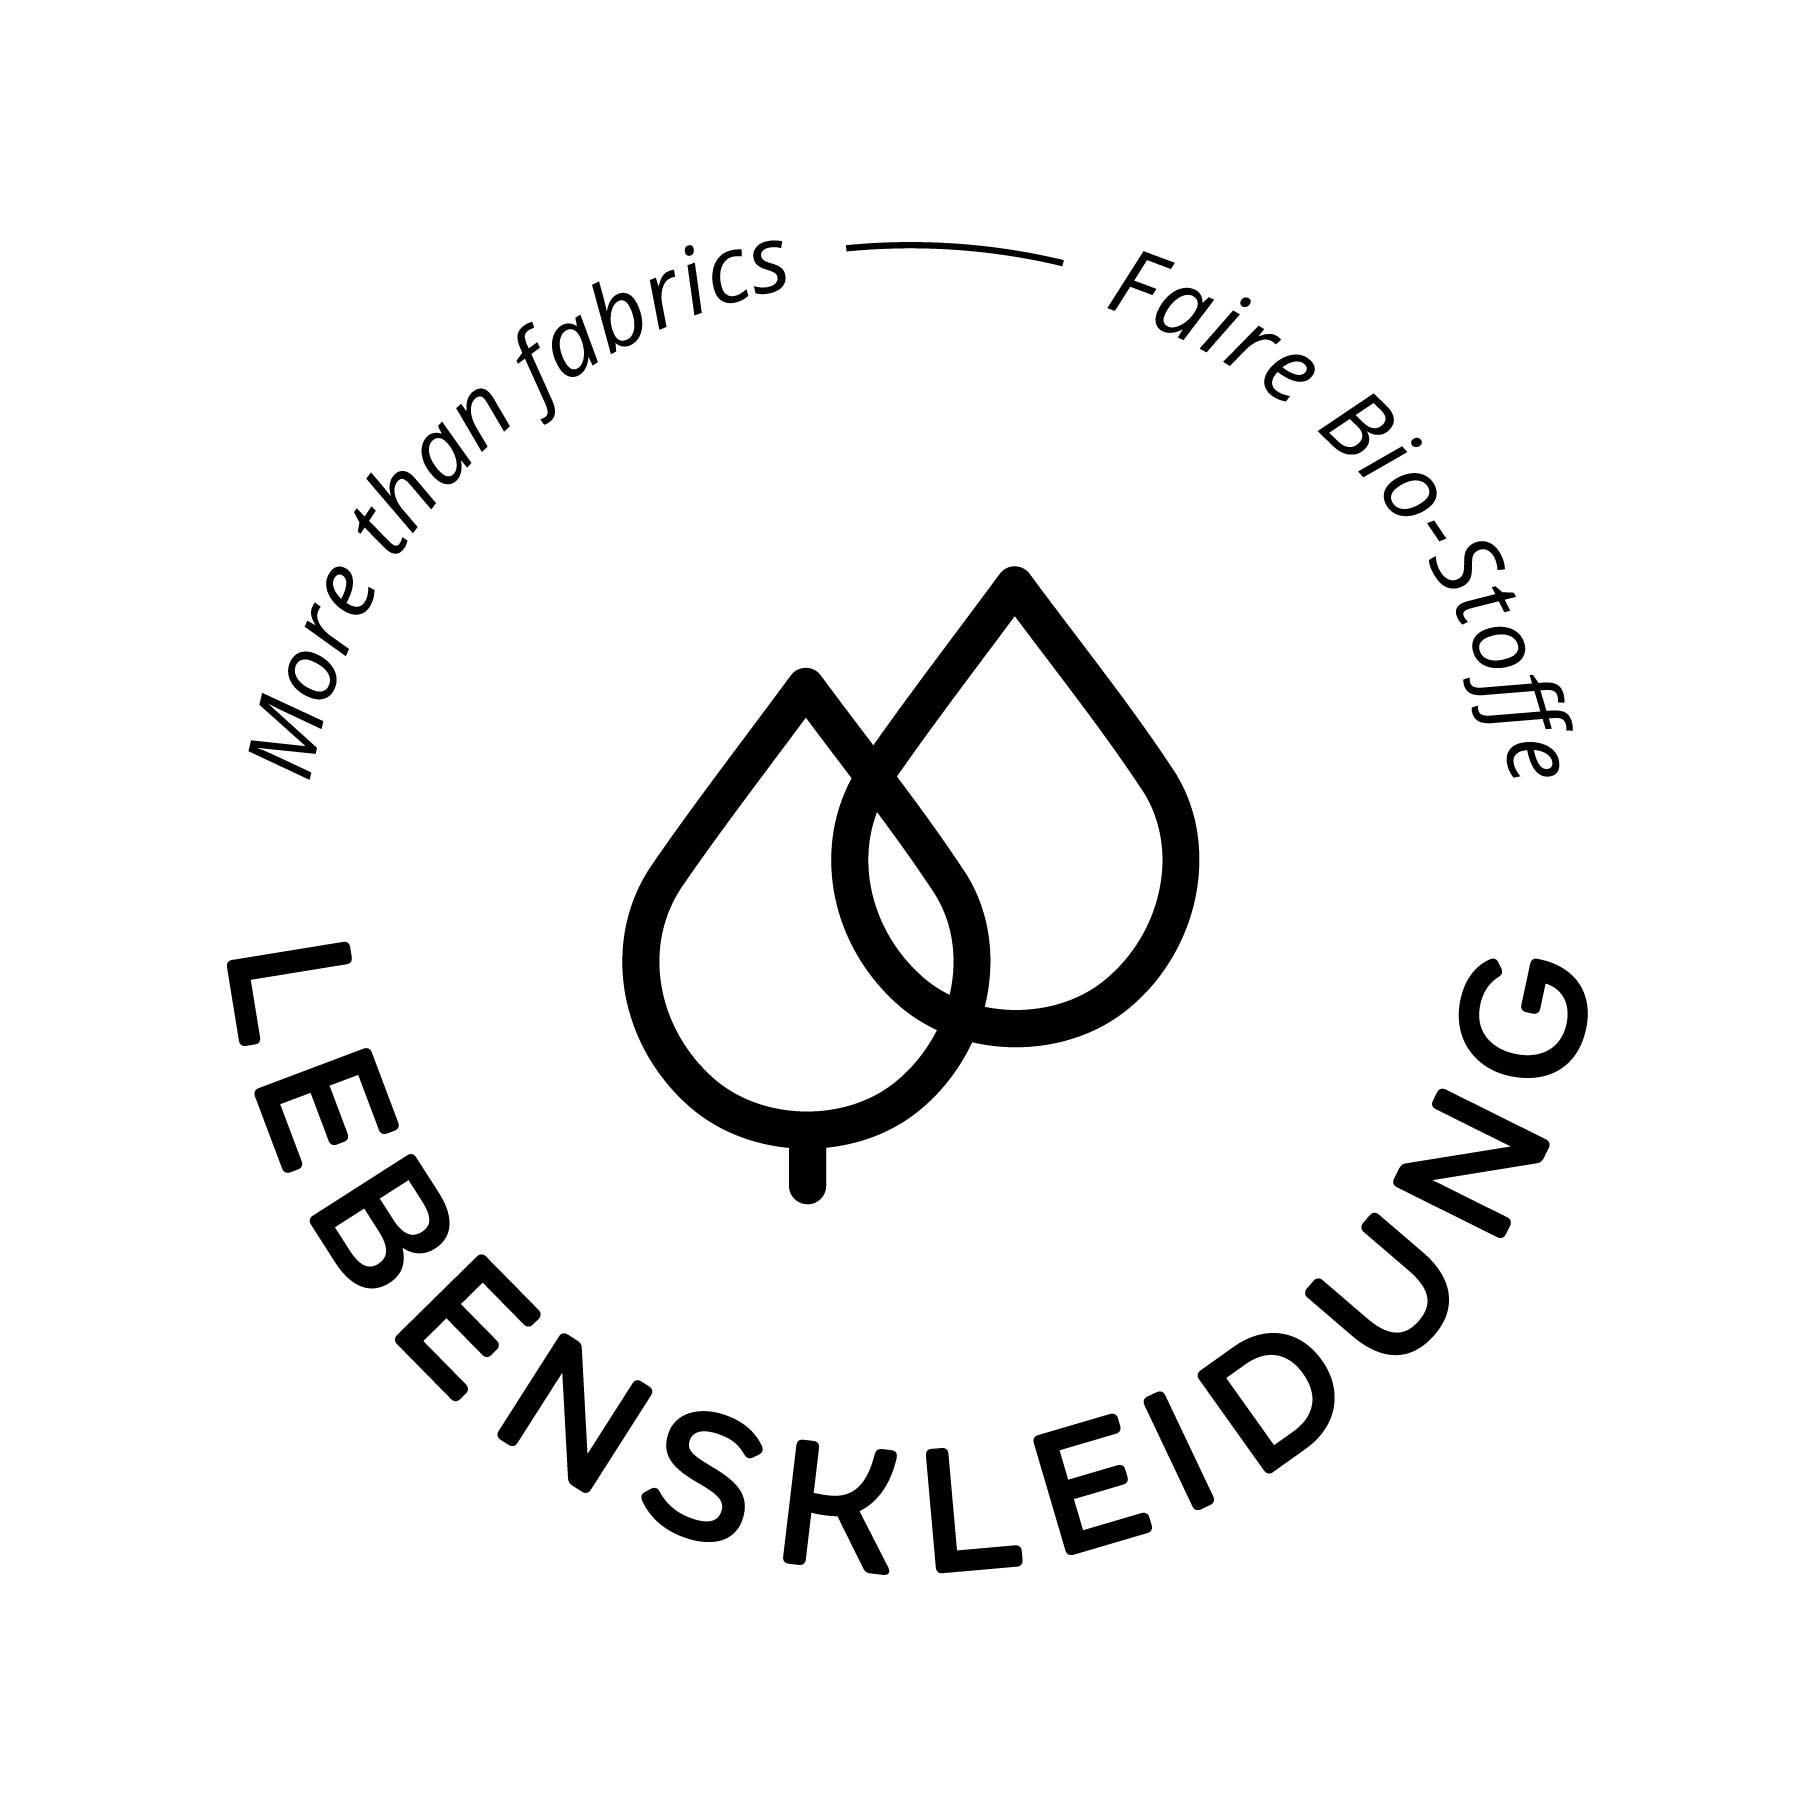 Organic RIB 2x1 (Cuff fabric) - Henna-2